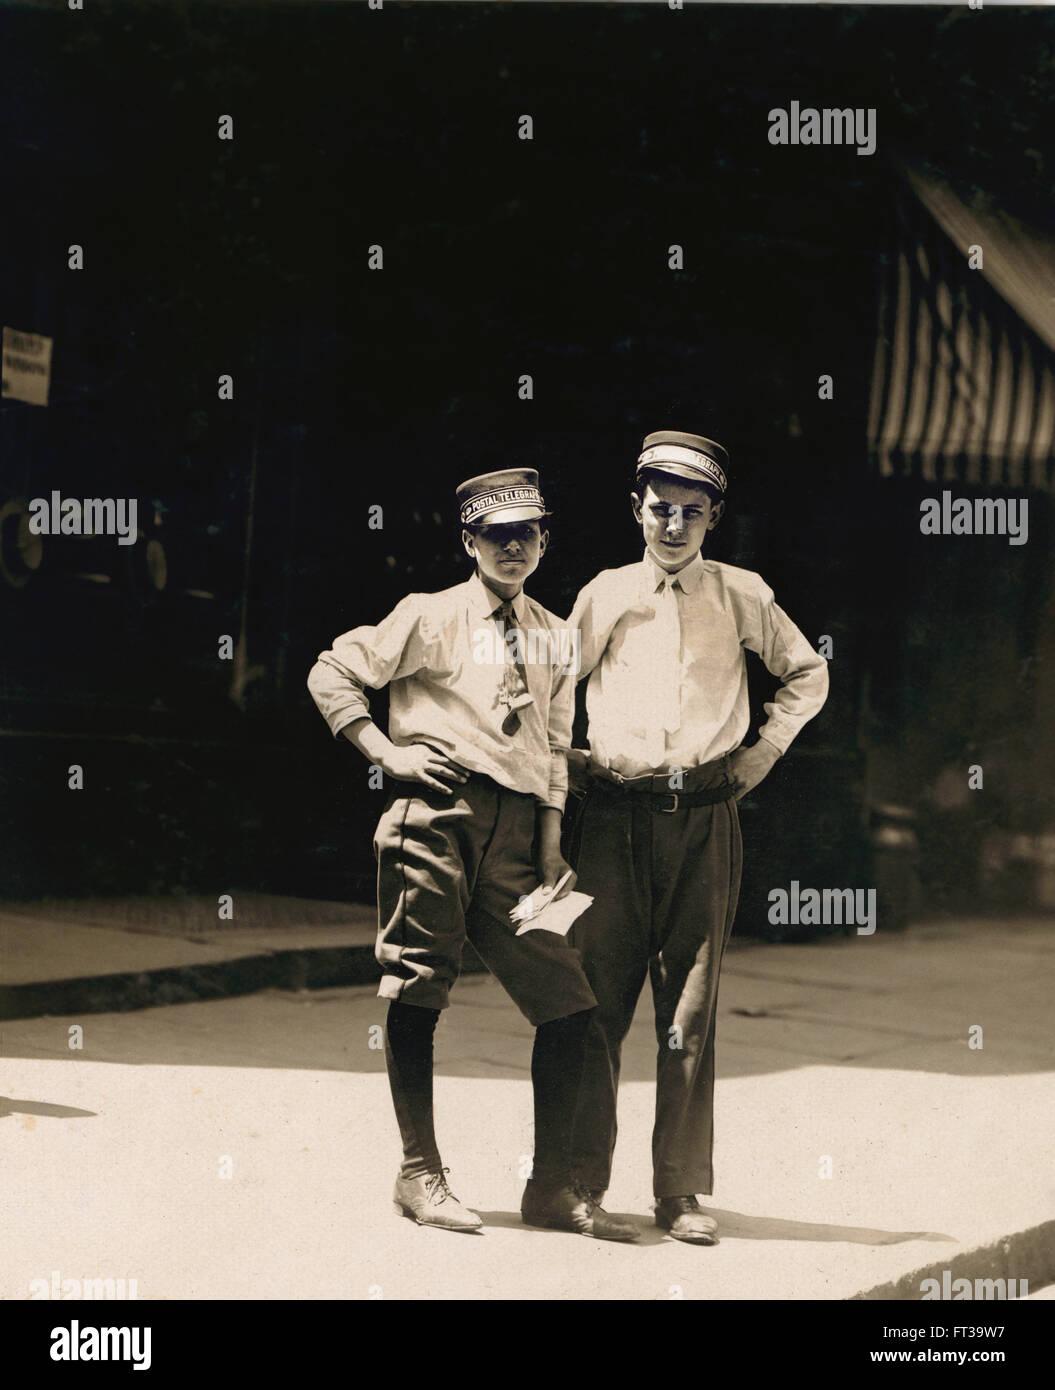 Two Young Telegraph Messengers, Broadway, New York City, New York, USA, circa 1910 - Stock Image